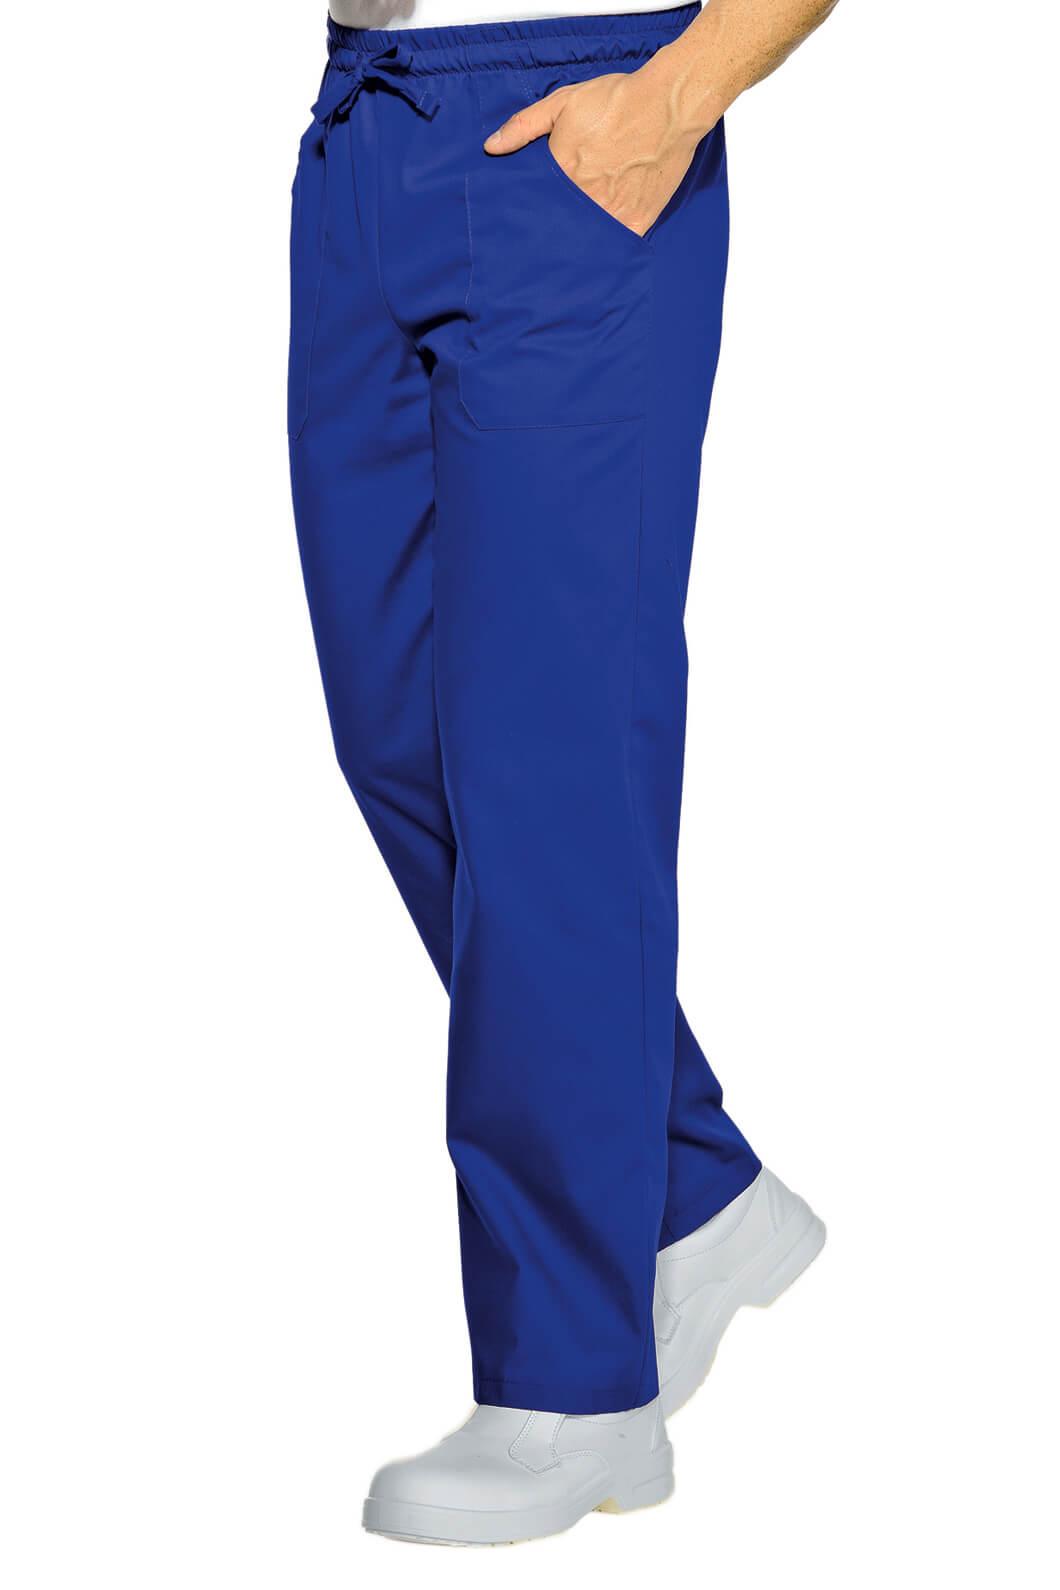 ISACCO Pantalon Cuisinier Bleu Cyan